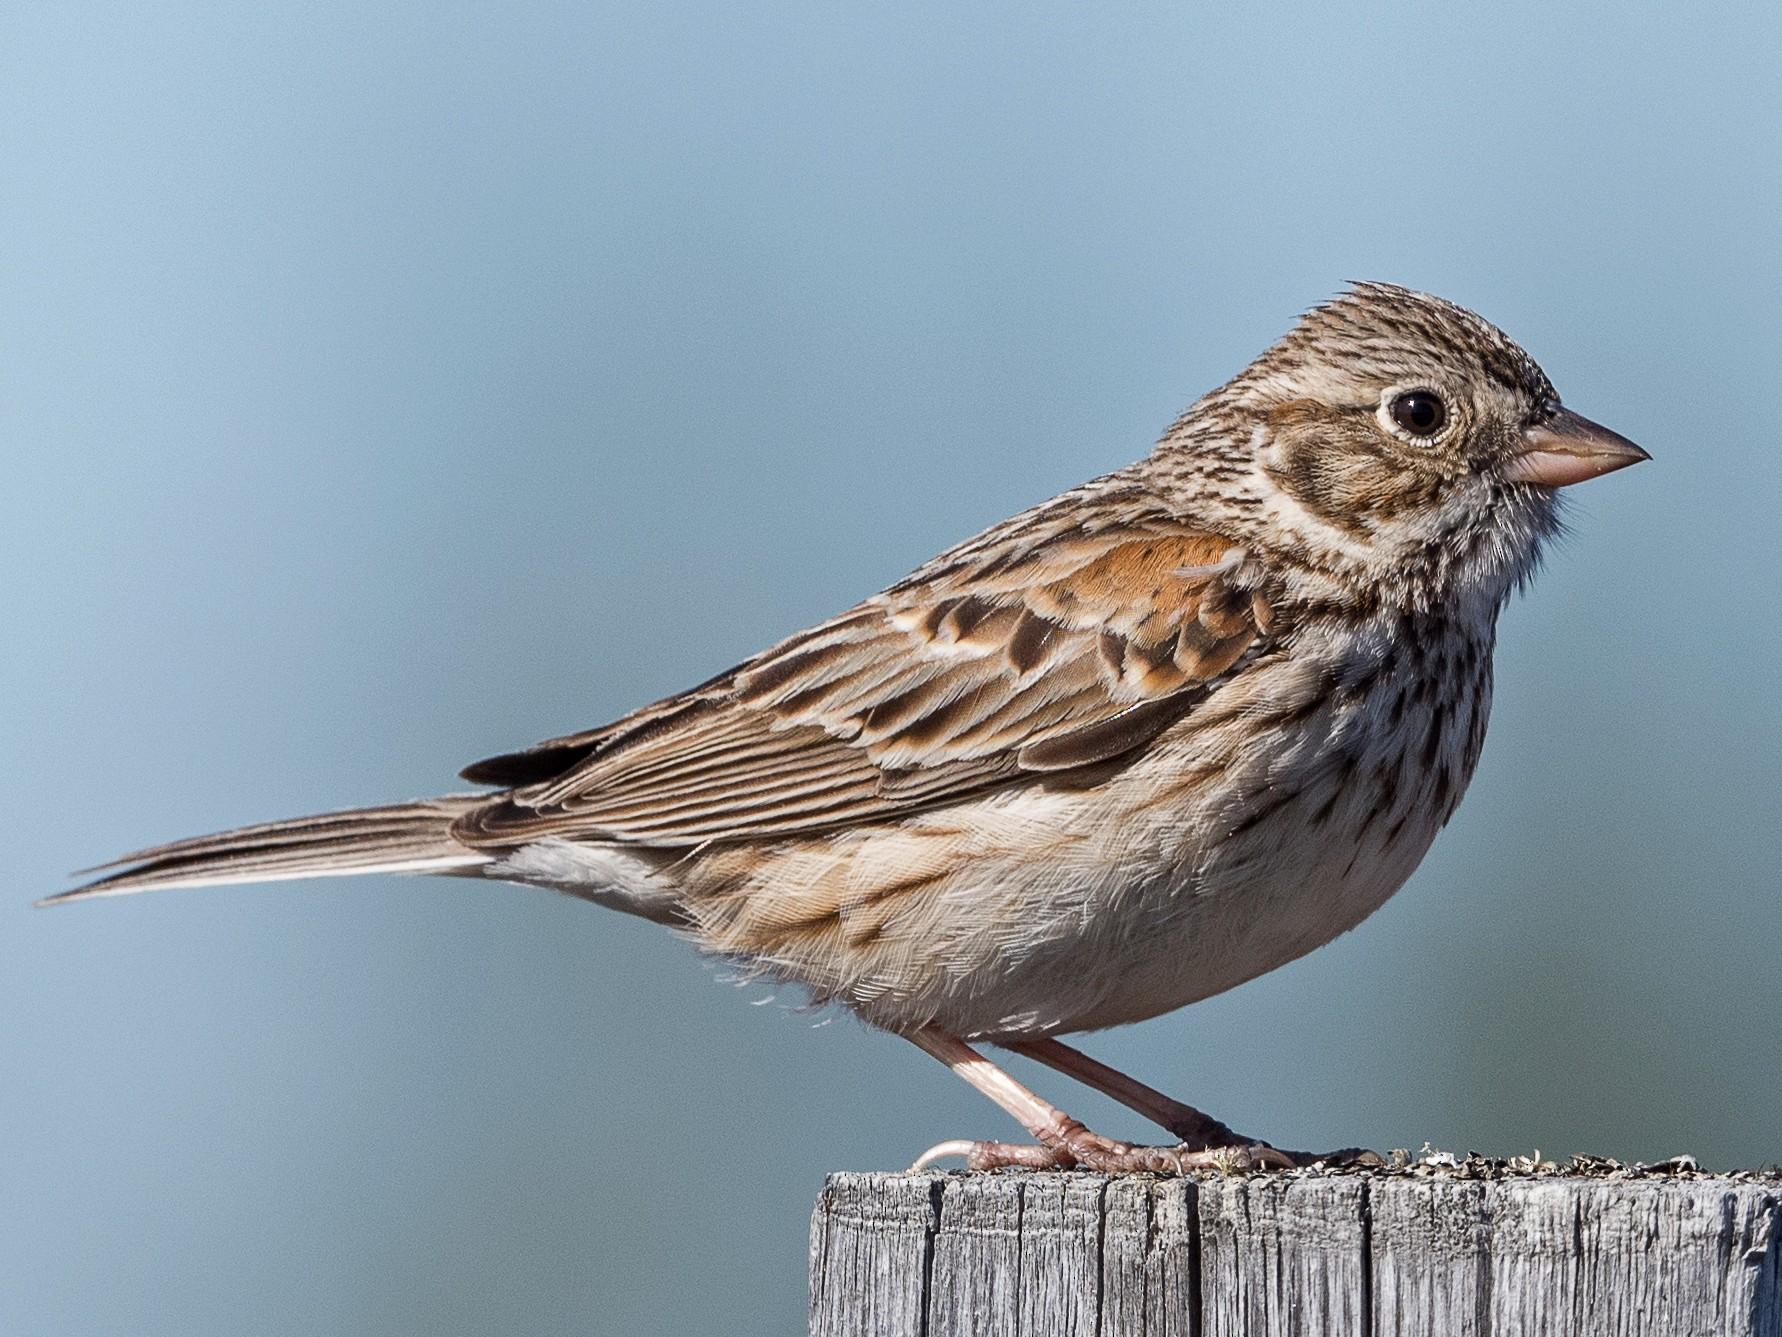 Vesper Sparrow - Simon Boivin